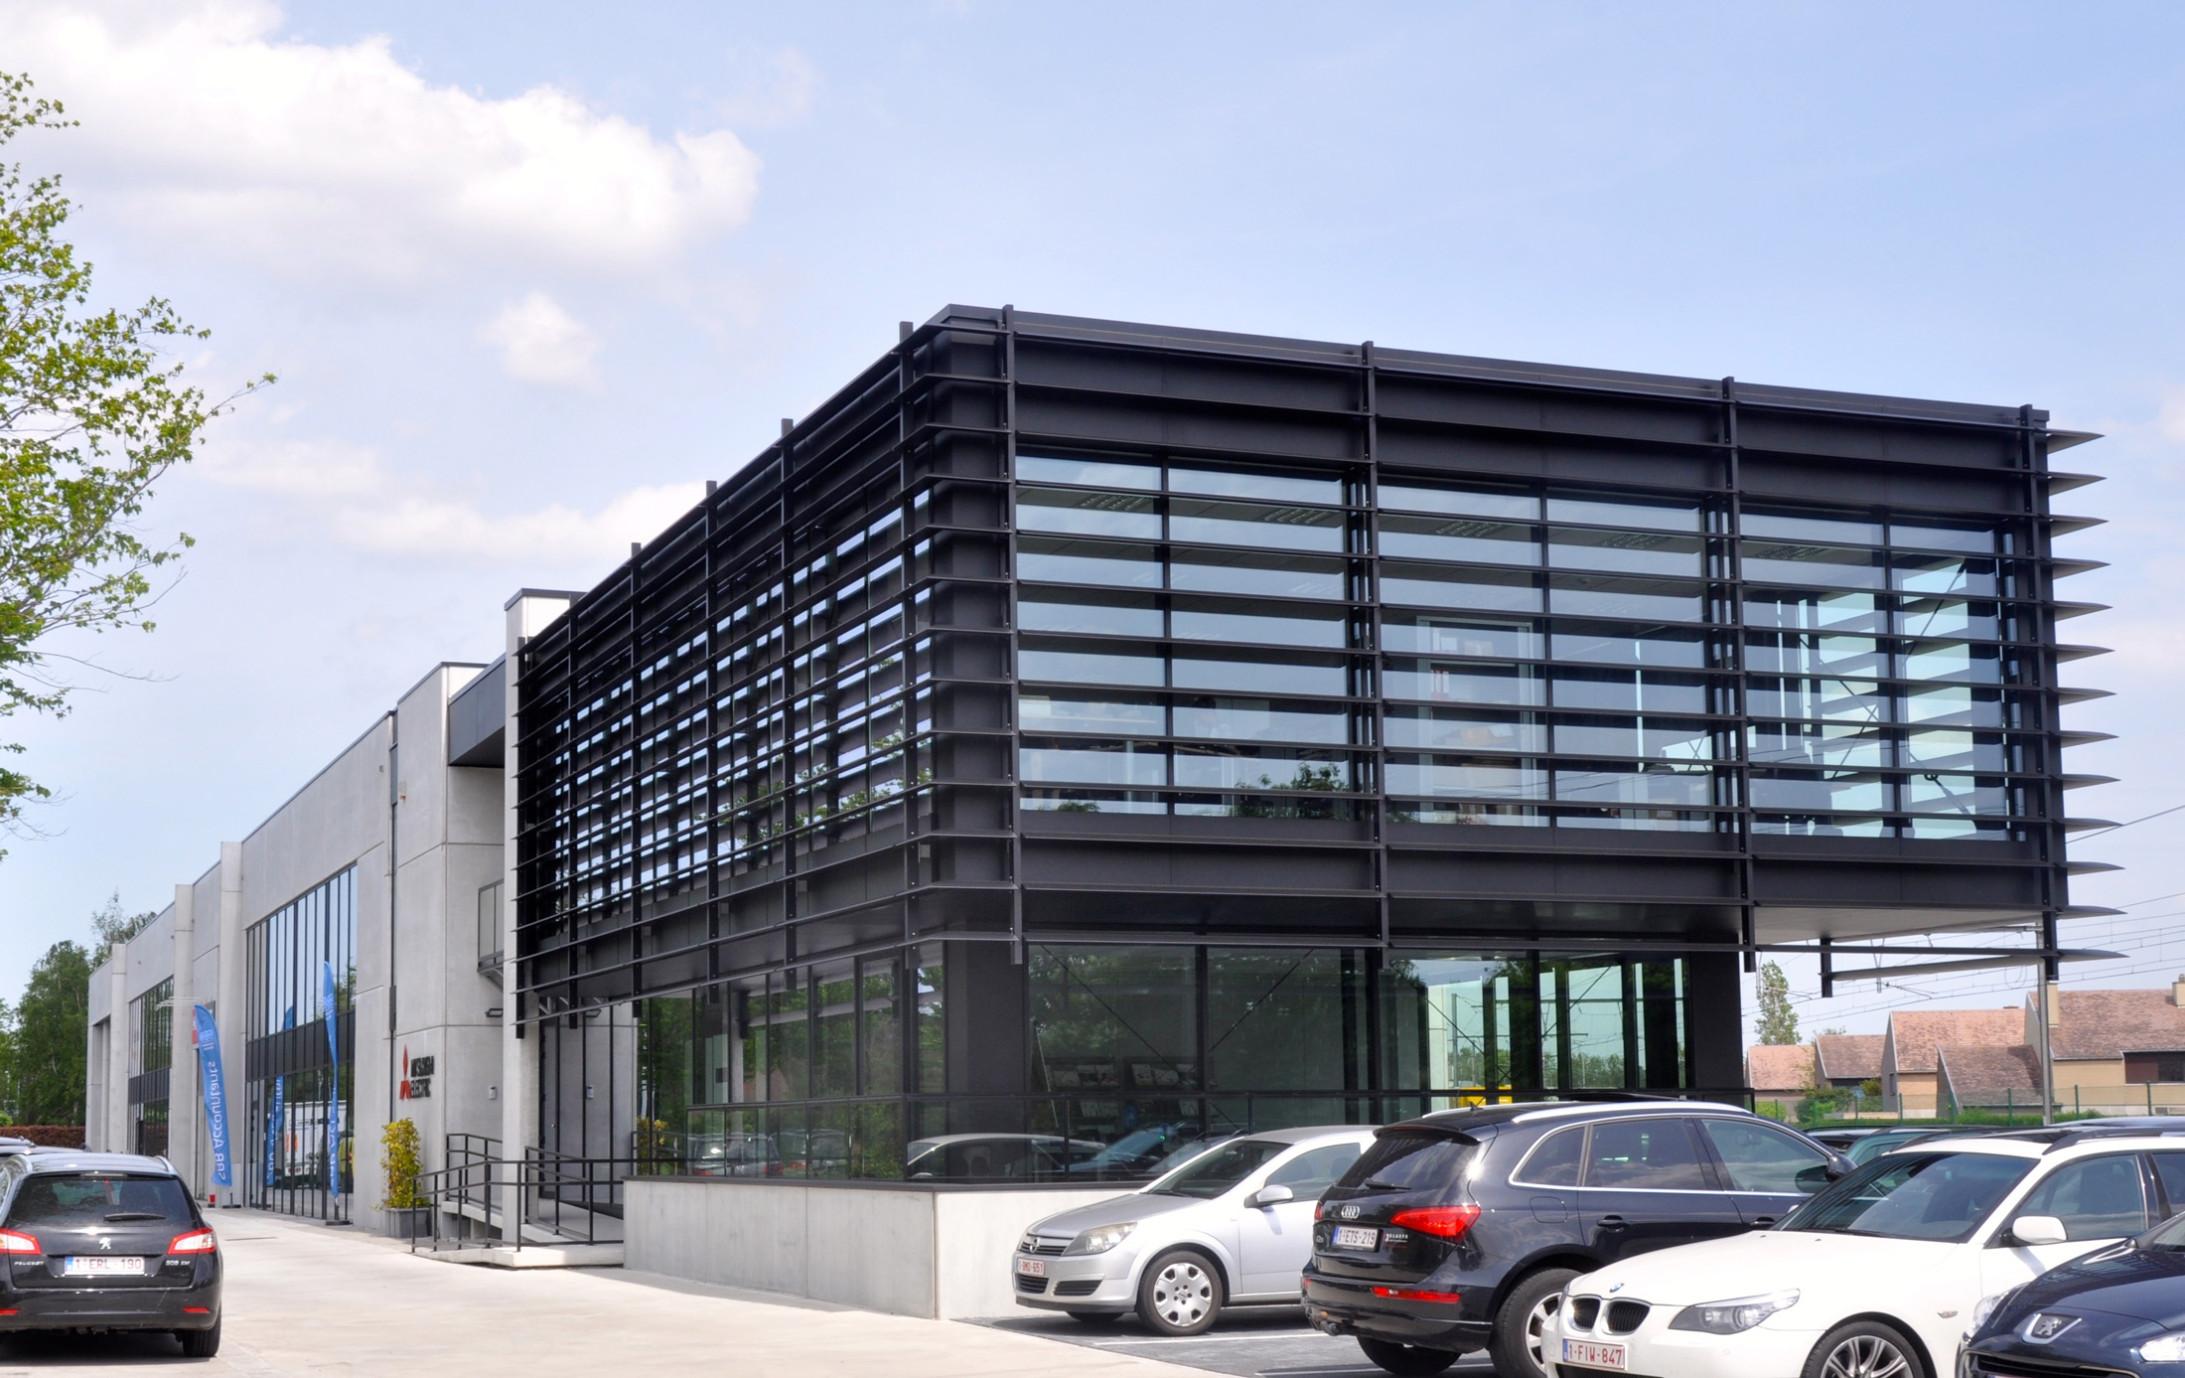 Kantoorgebouw Autobaan3_Brugge_Claeys Architecten.jpg